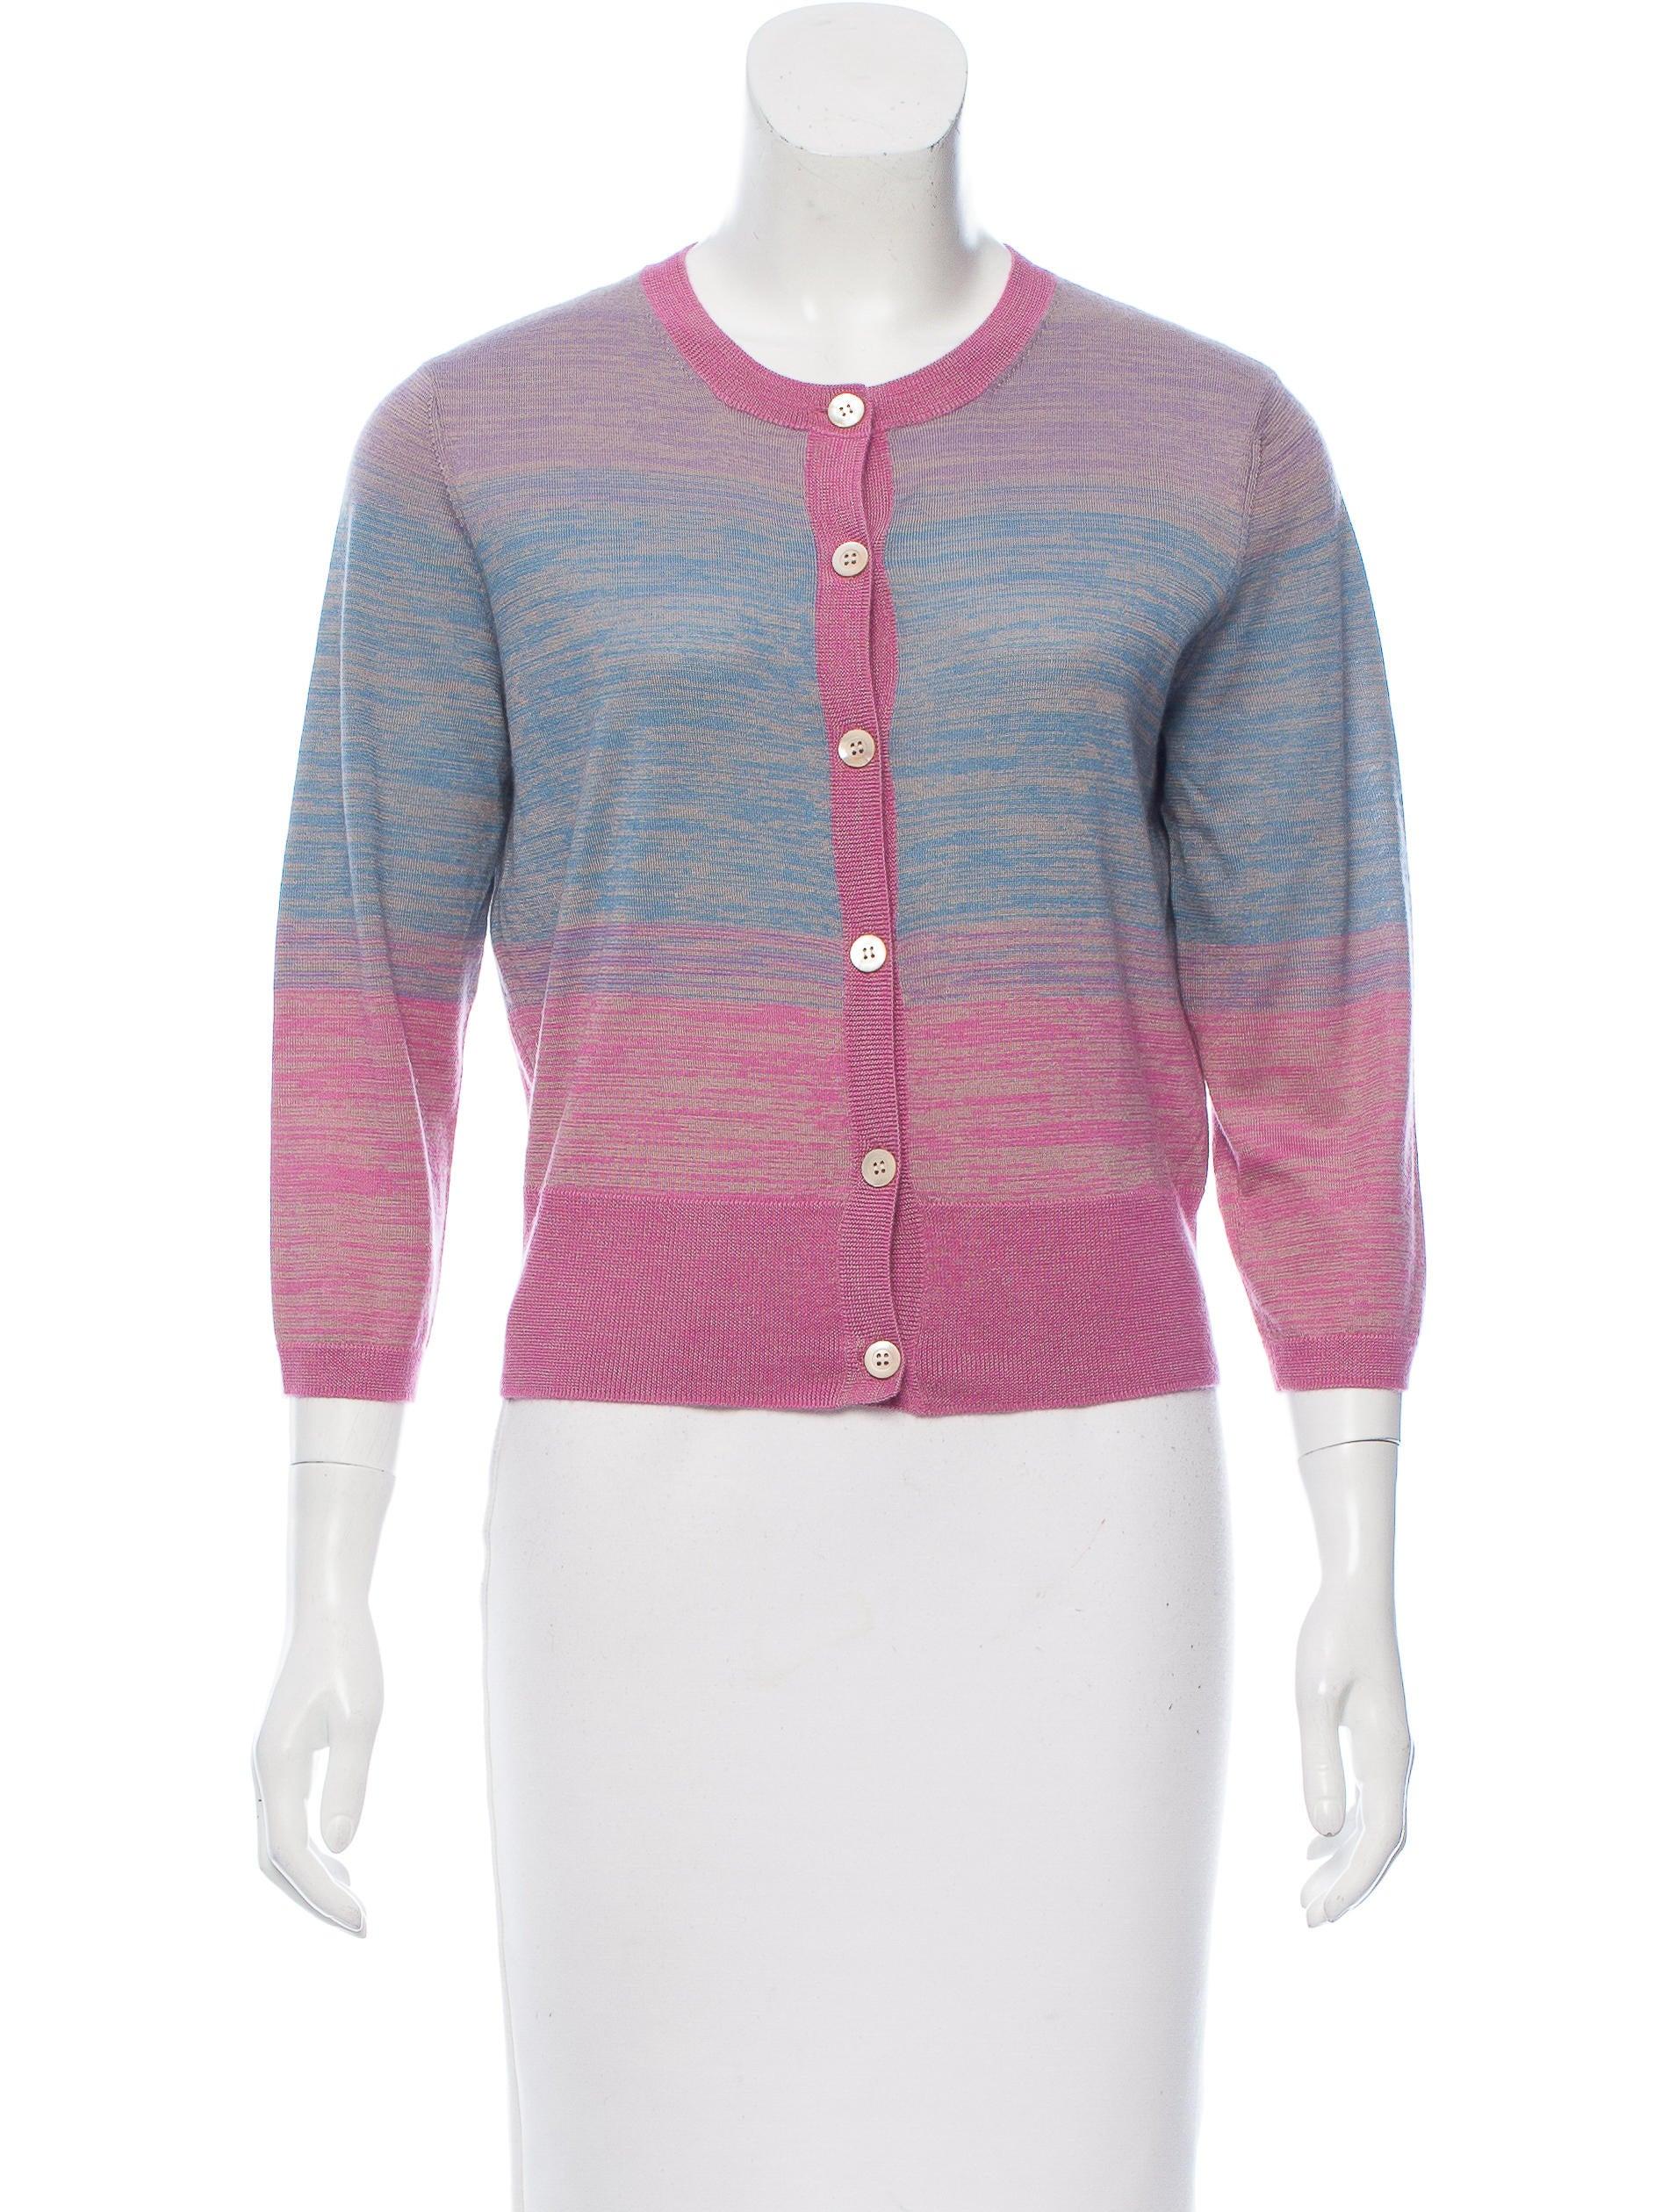 Dries Van Noten Silk & Cashmere-Blend Cardigan - Clothing ...